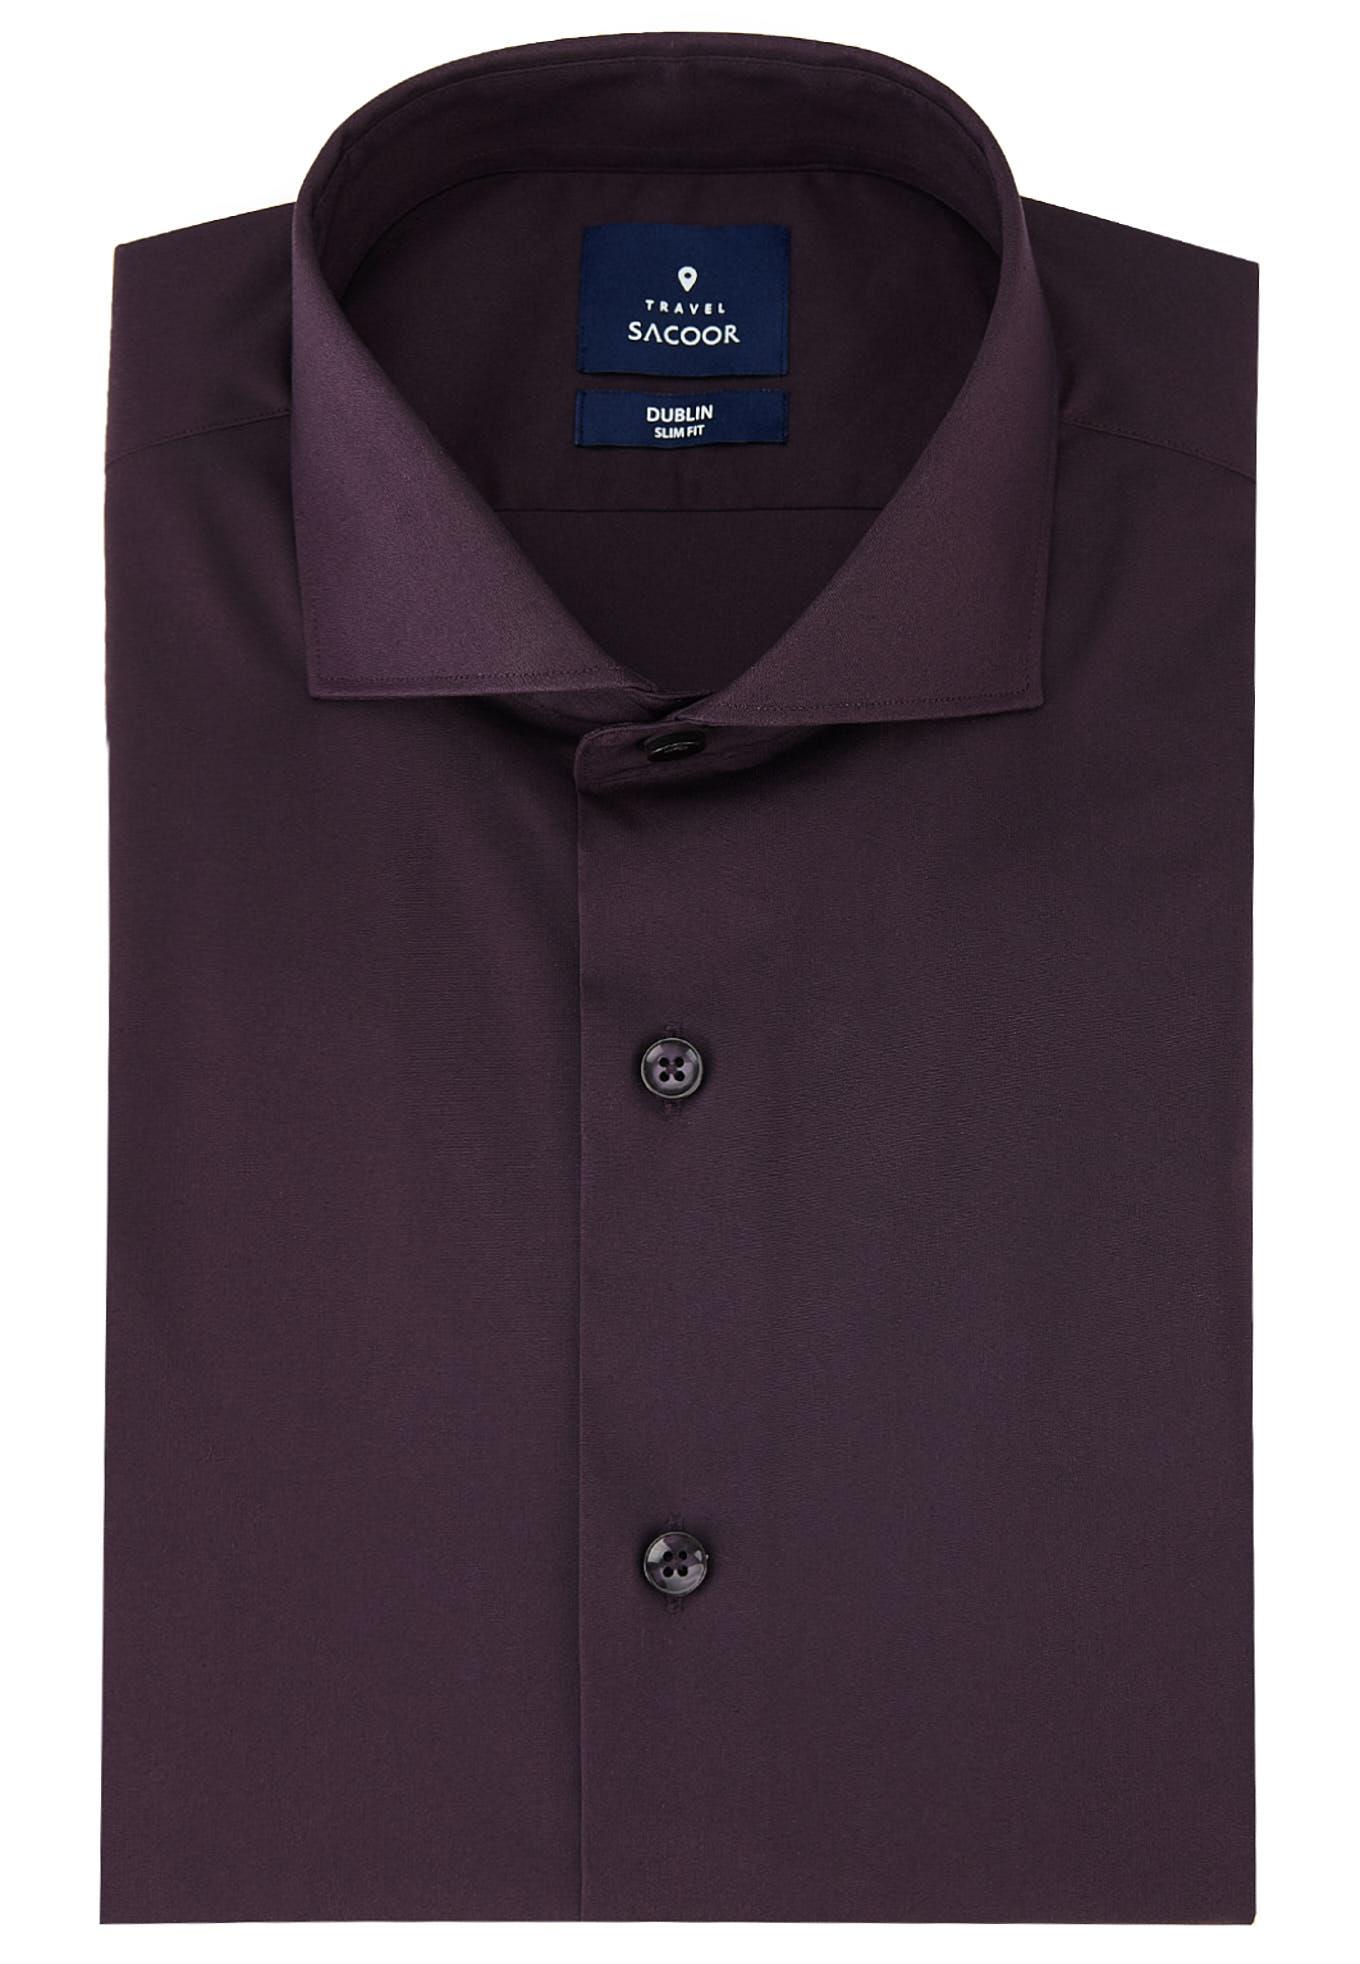 Shirt Plum Formal Man